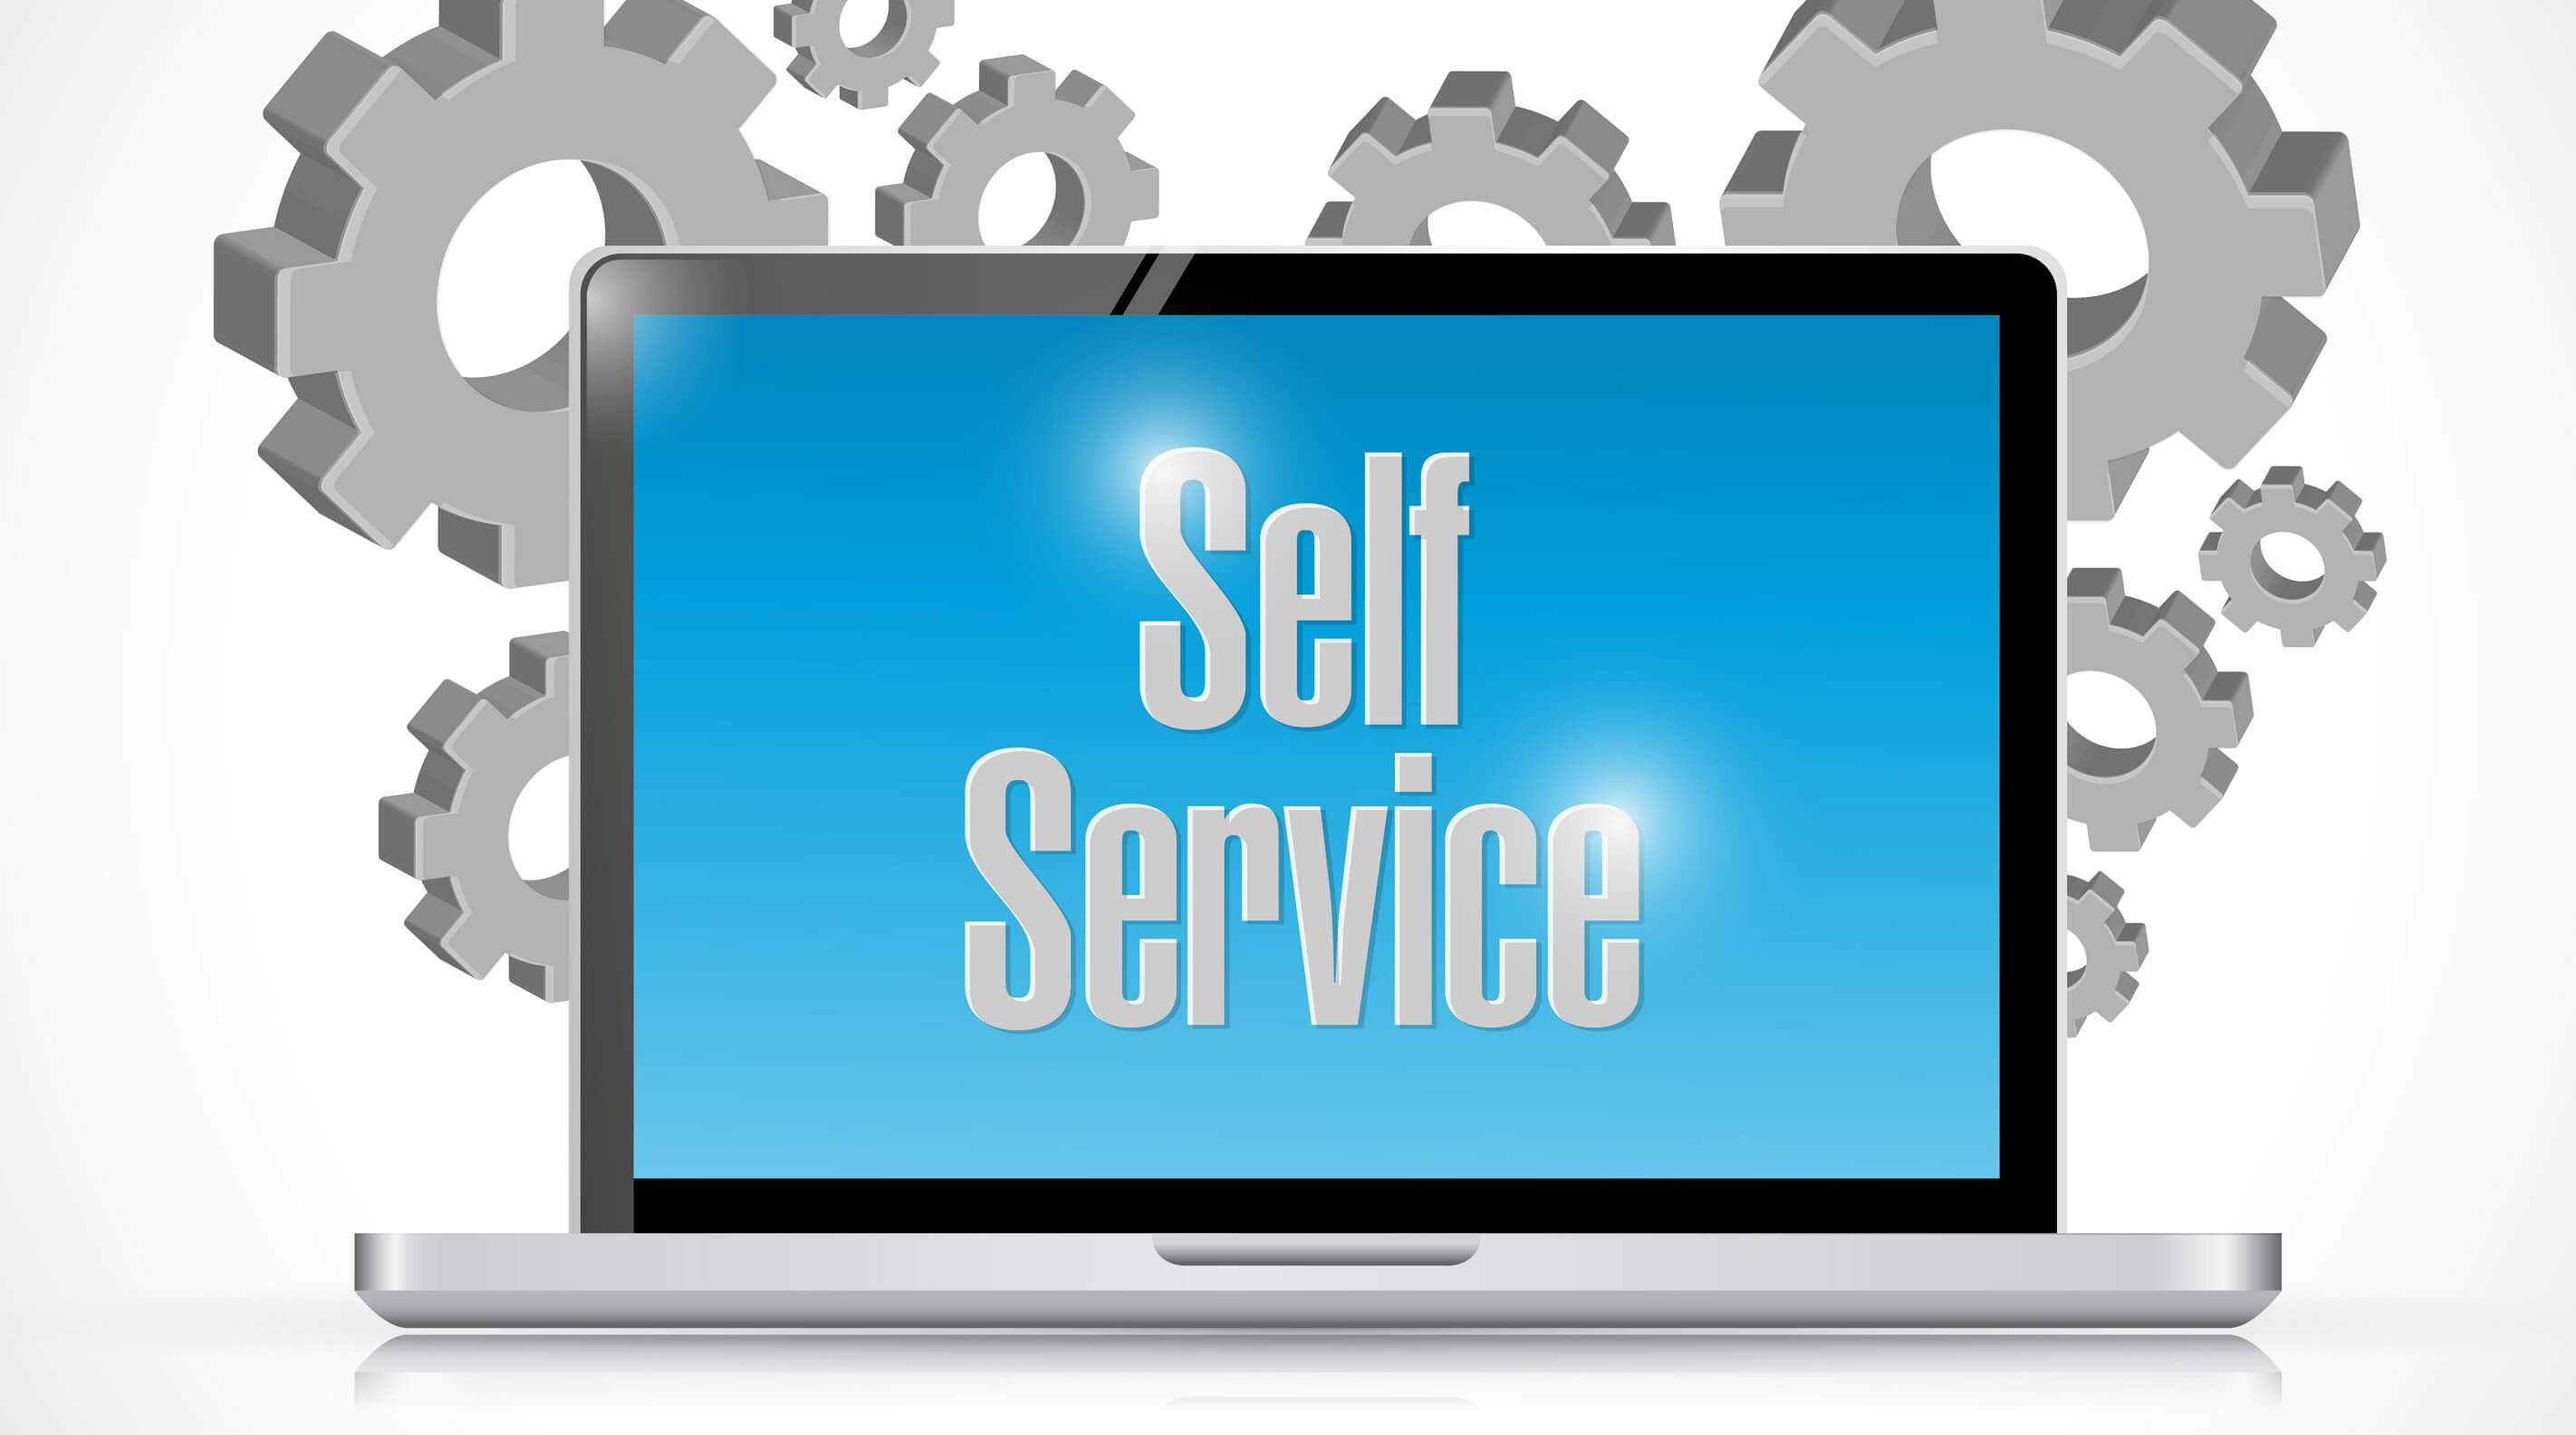 amazonification of self-service